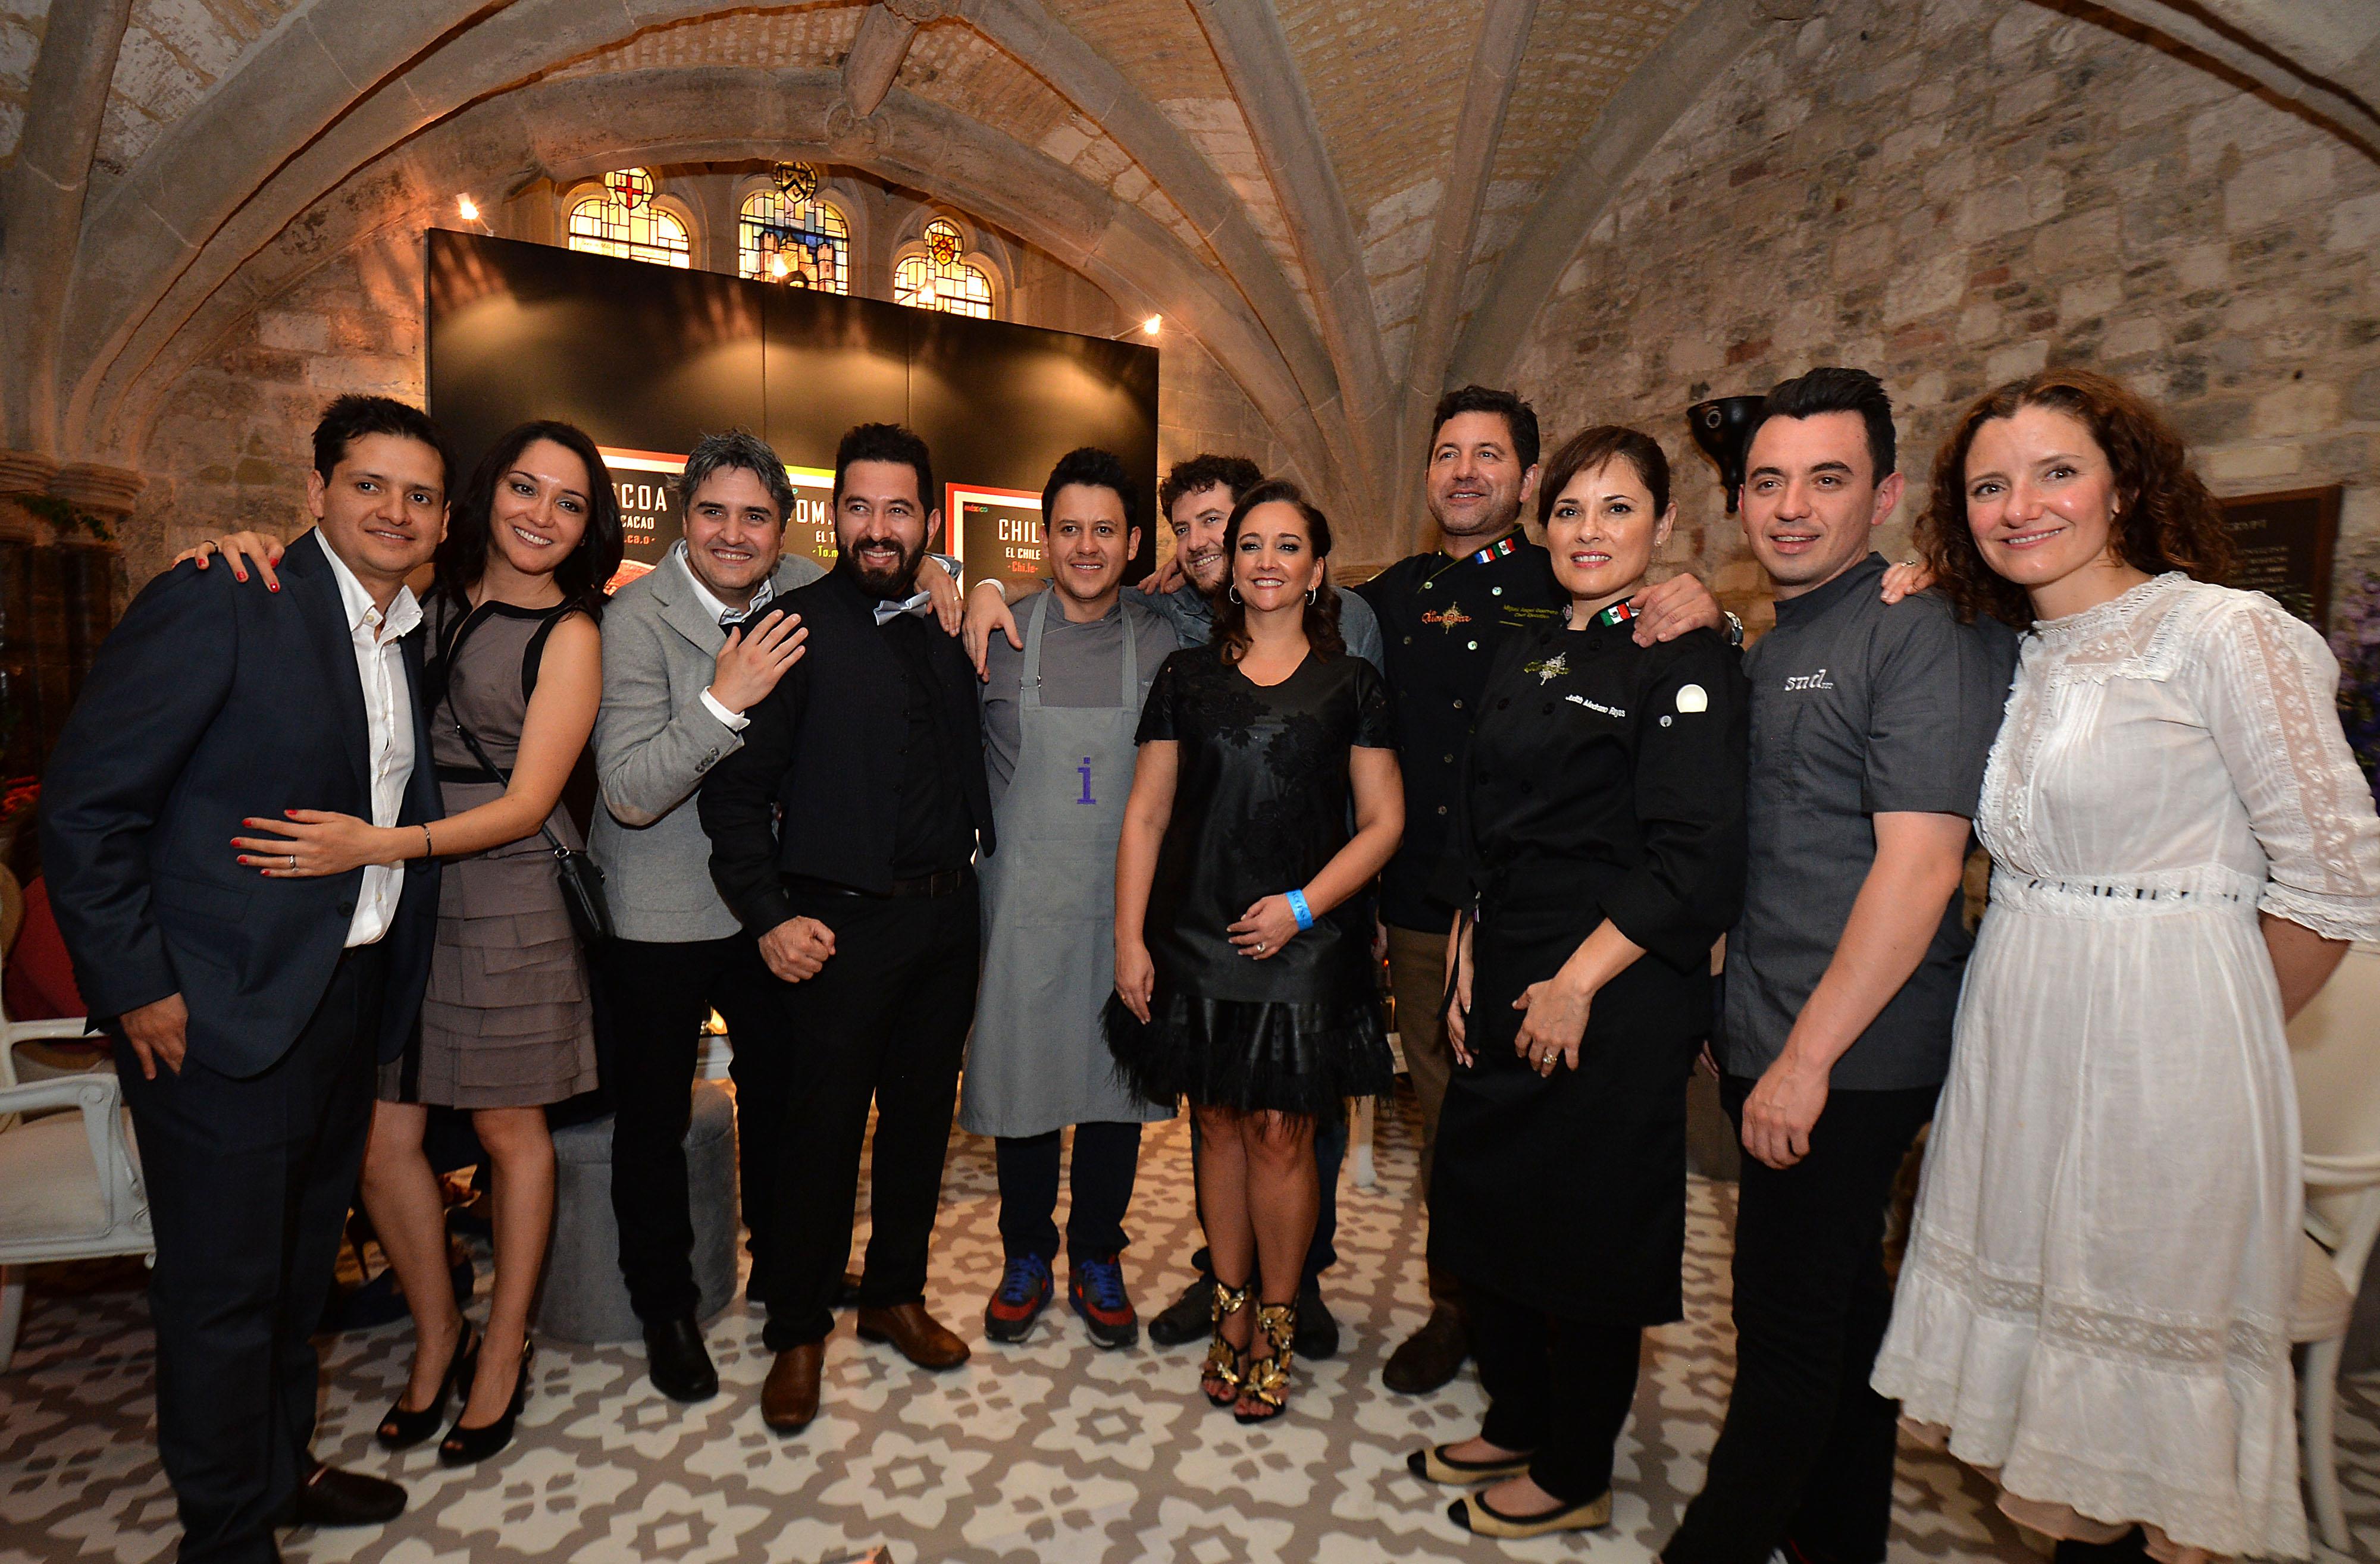 La Secretaria de Turismo (SECTUR), Claudia Ruiz Massieu  presenció la ceremonia encabezada por Charles Reed, Group Managing Director de The World`s 50 Best Restaurantes Academy.